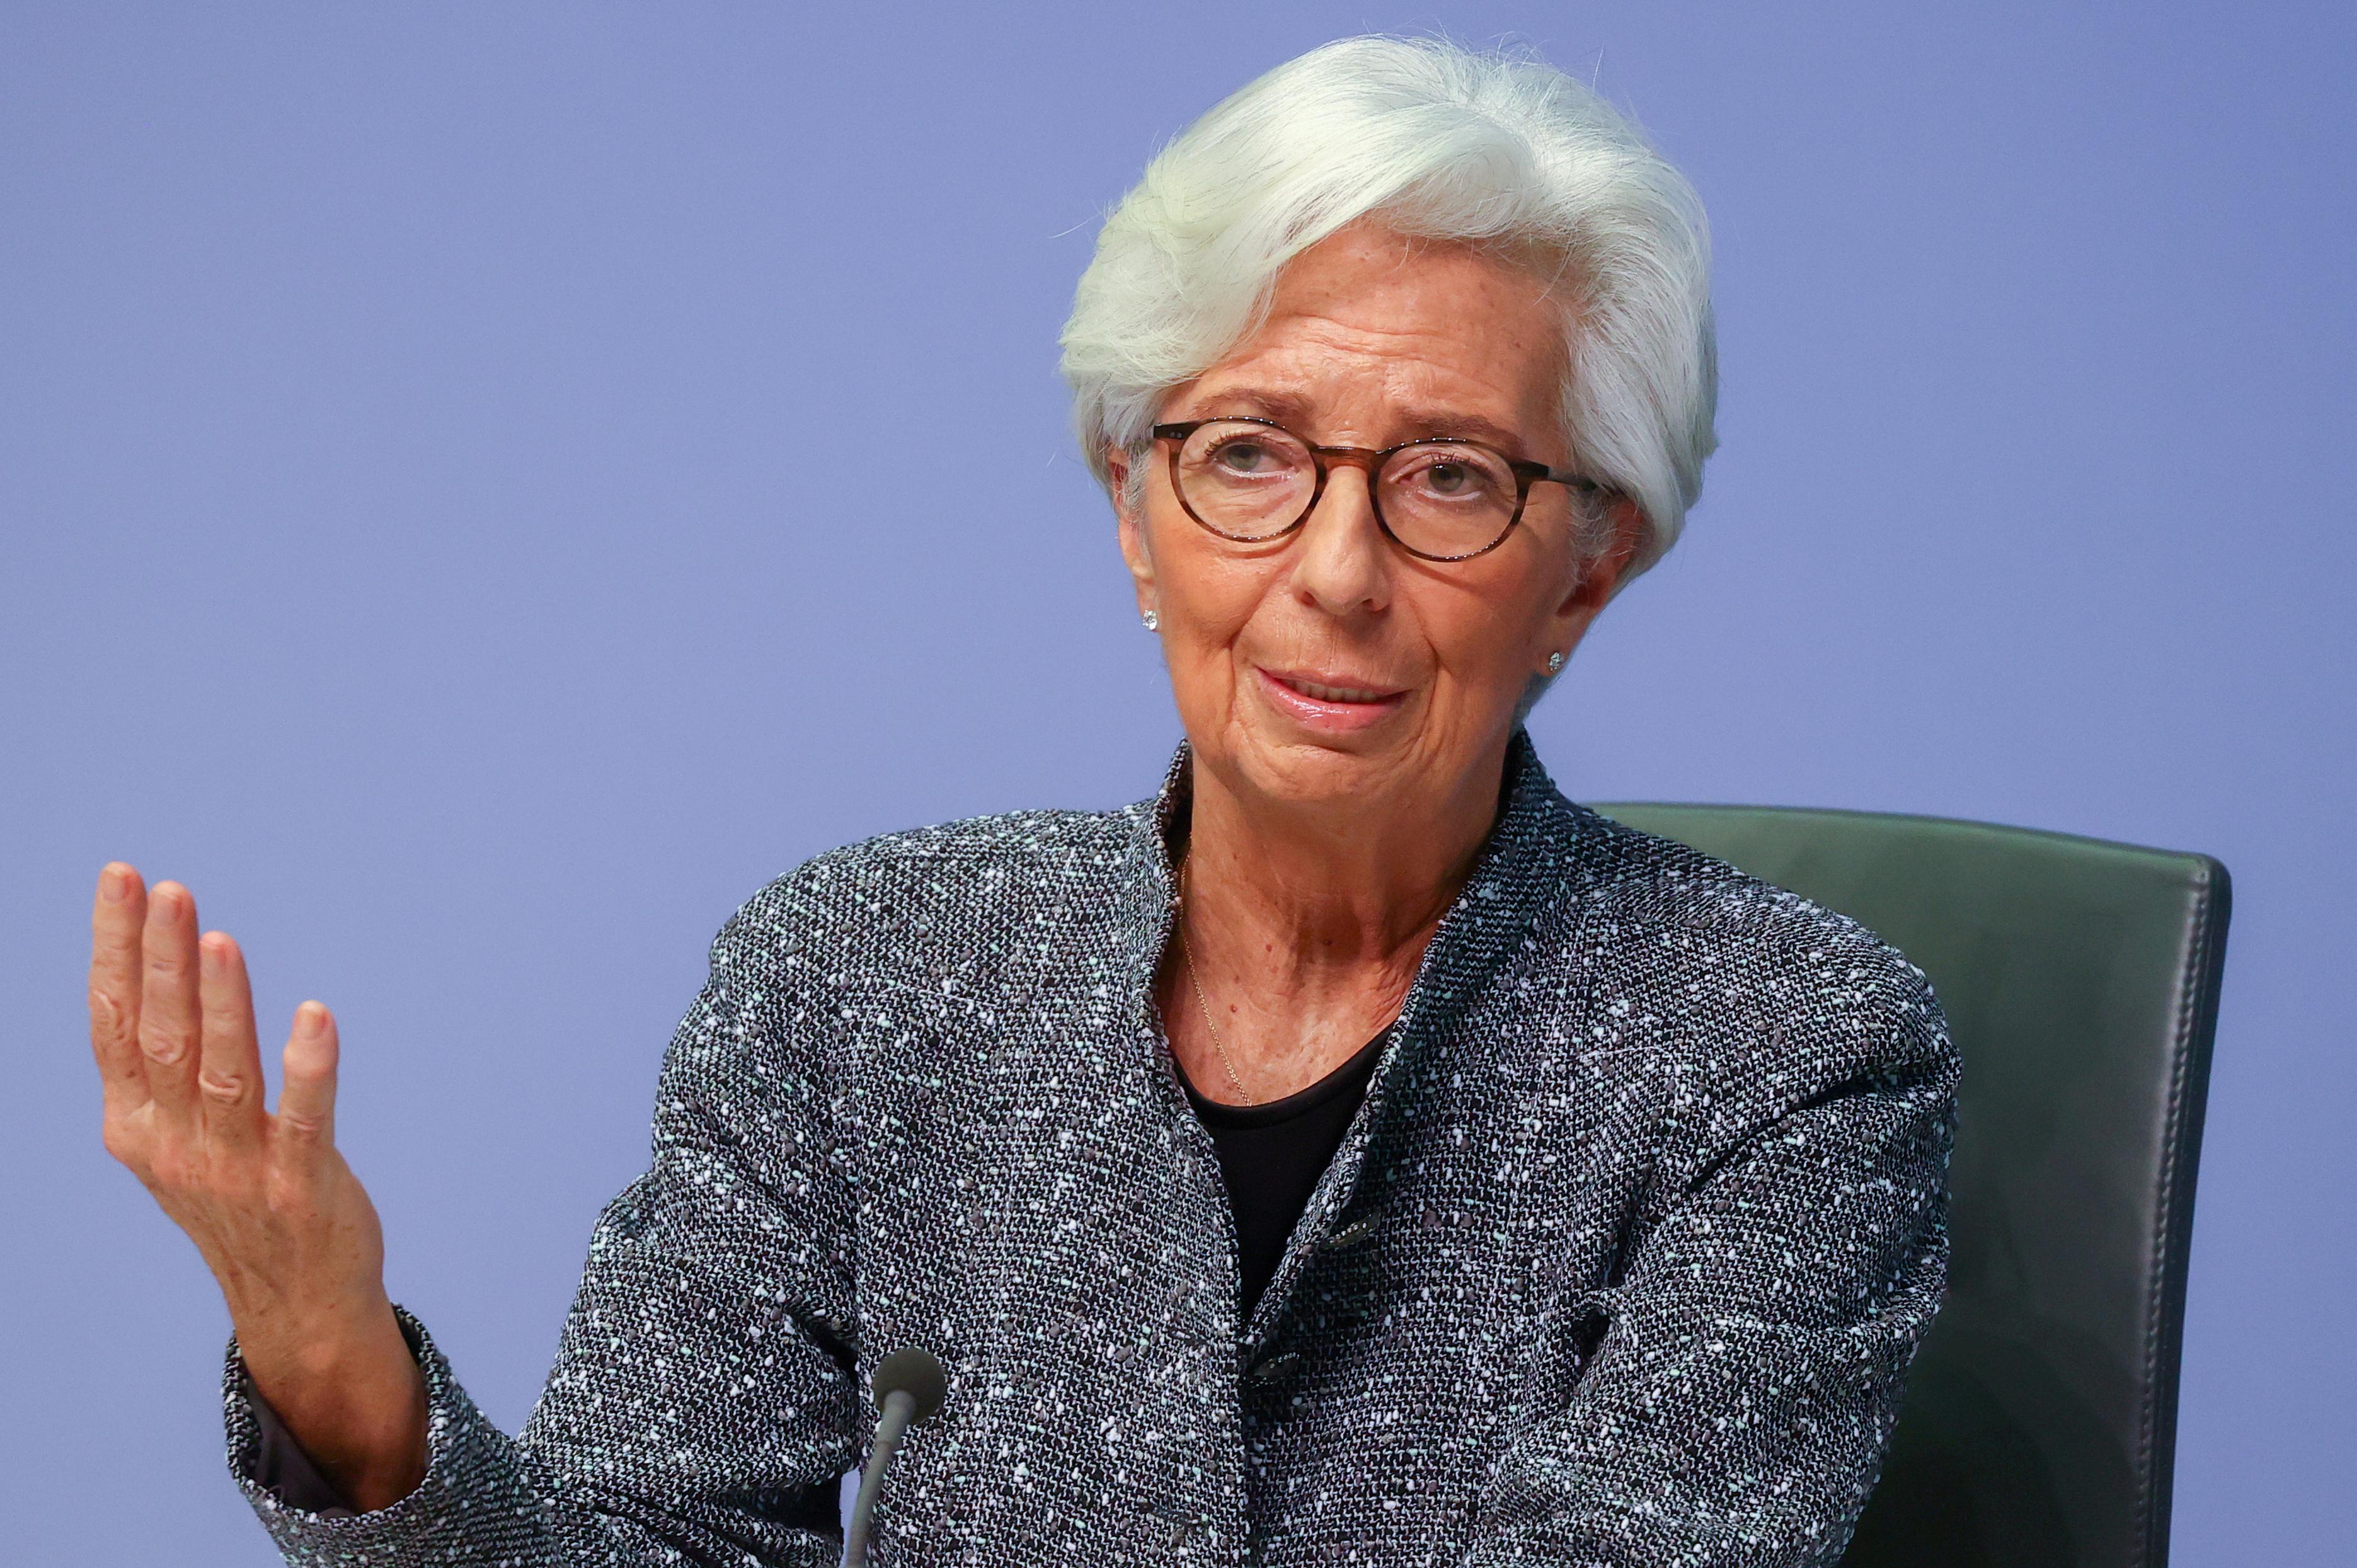 European Central Bank (ECB) President Christine Lagarde in Frankfurt, Germany, March 12, 2020. REUTERS/Kai Pfaffenbach/File Photo